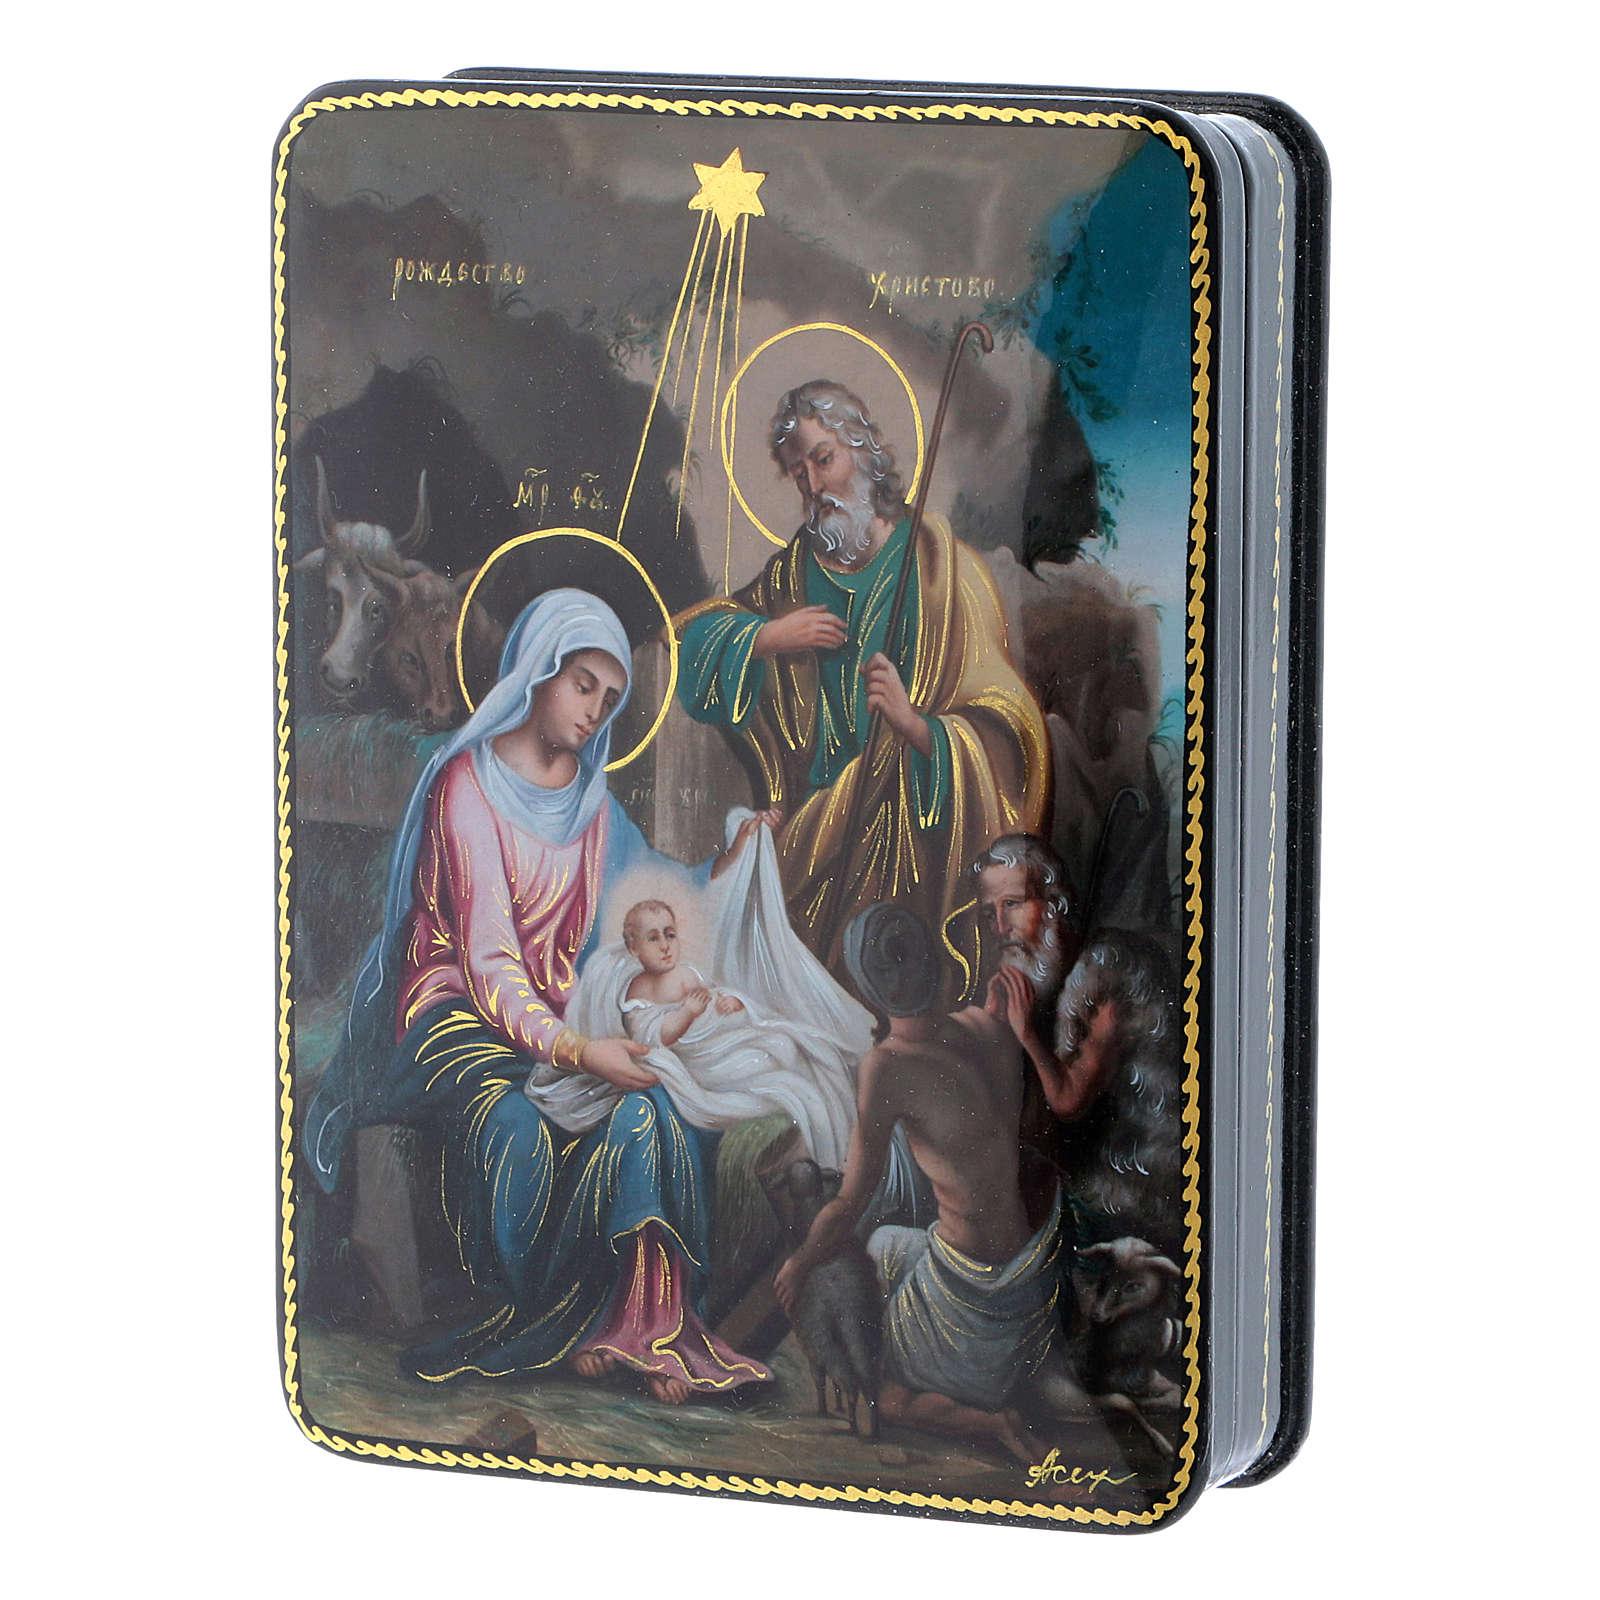 Lacca russa cartapesta Cristo Nascita Fedoskino style 15x11 4